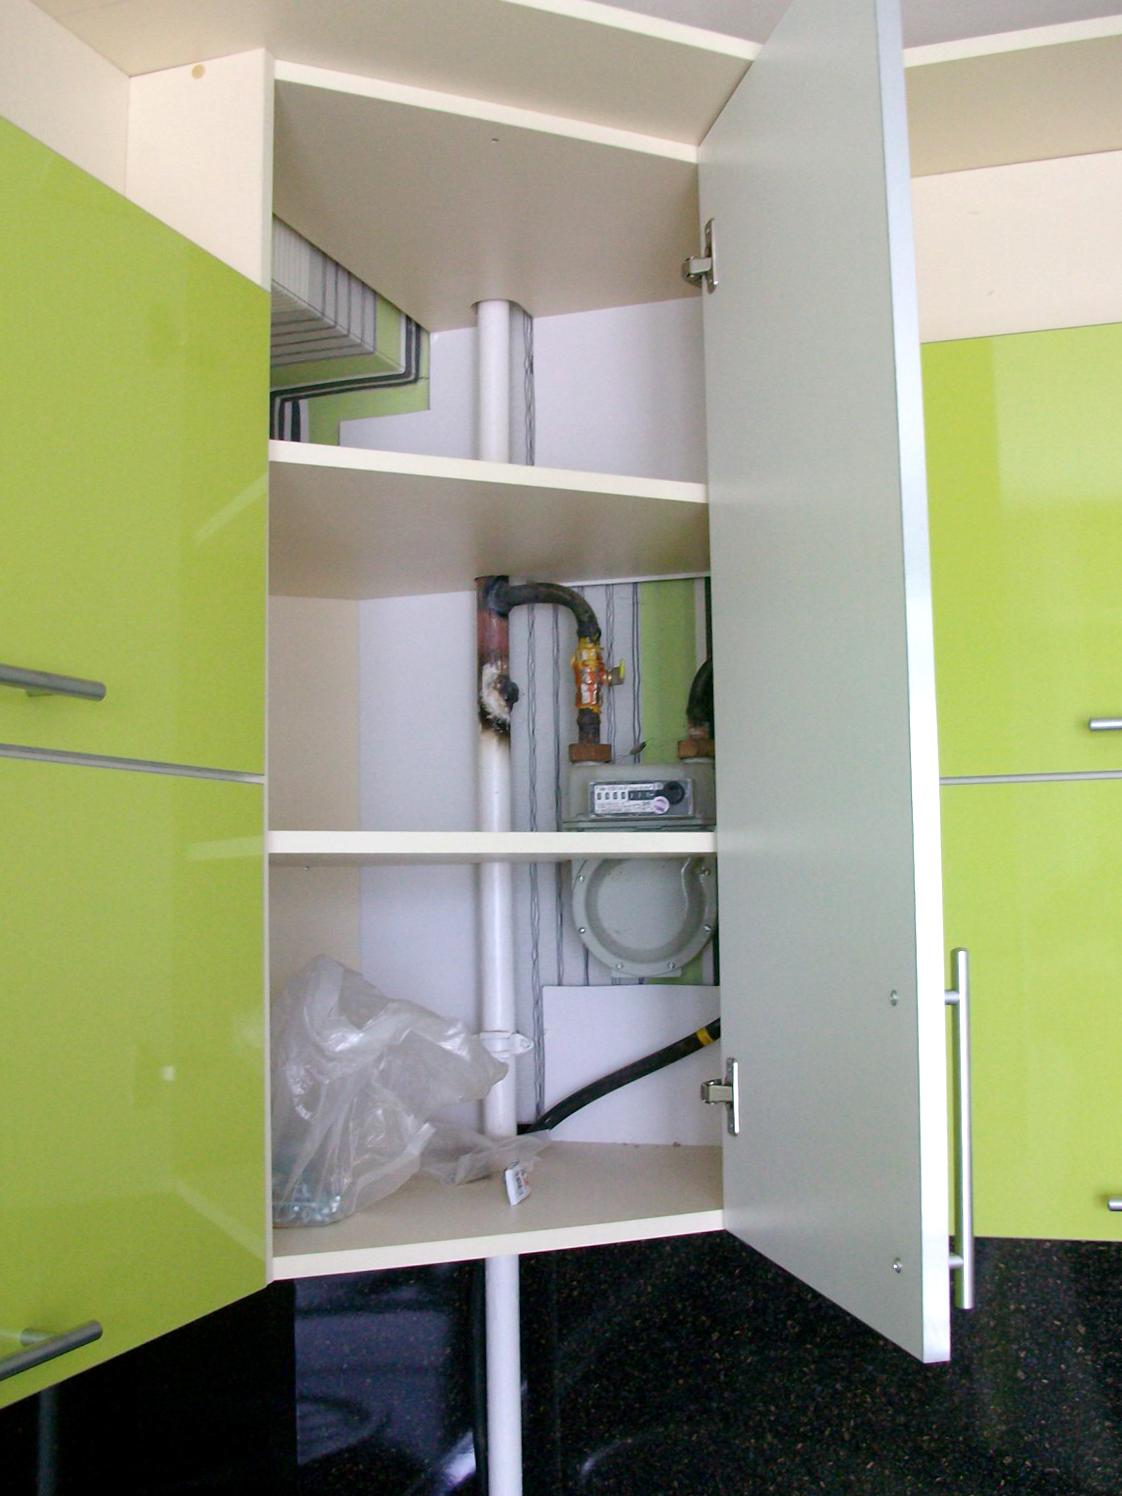 Трубы в кухонном шкафчике